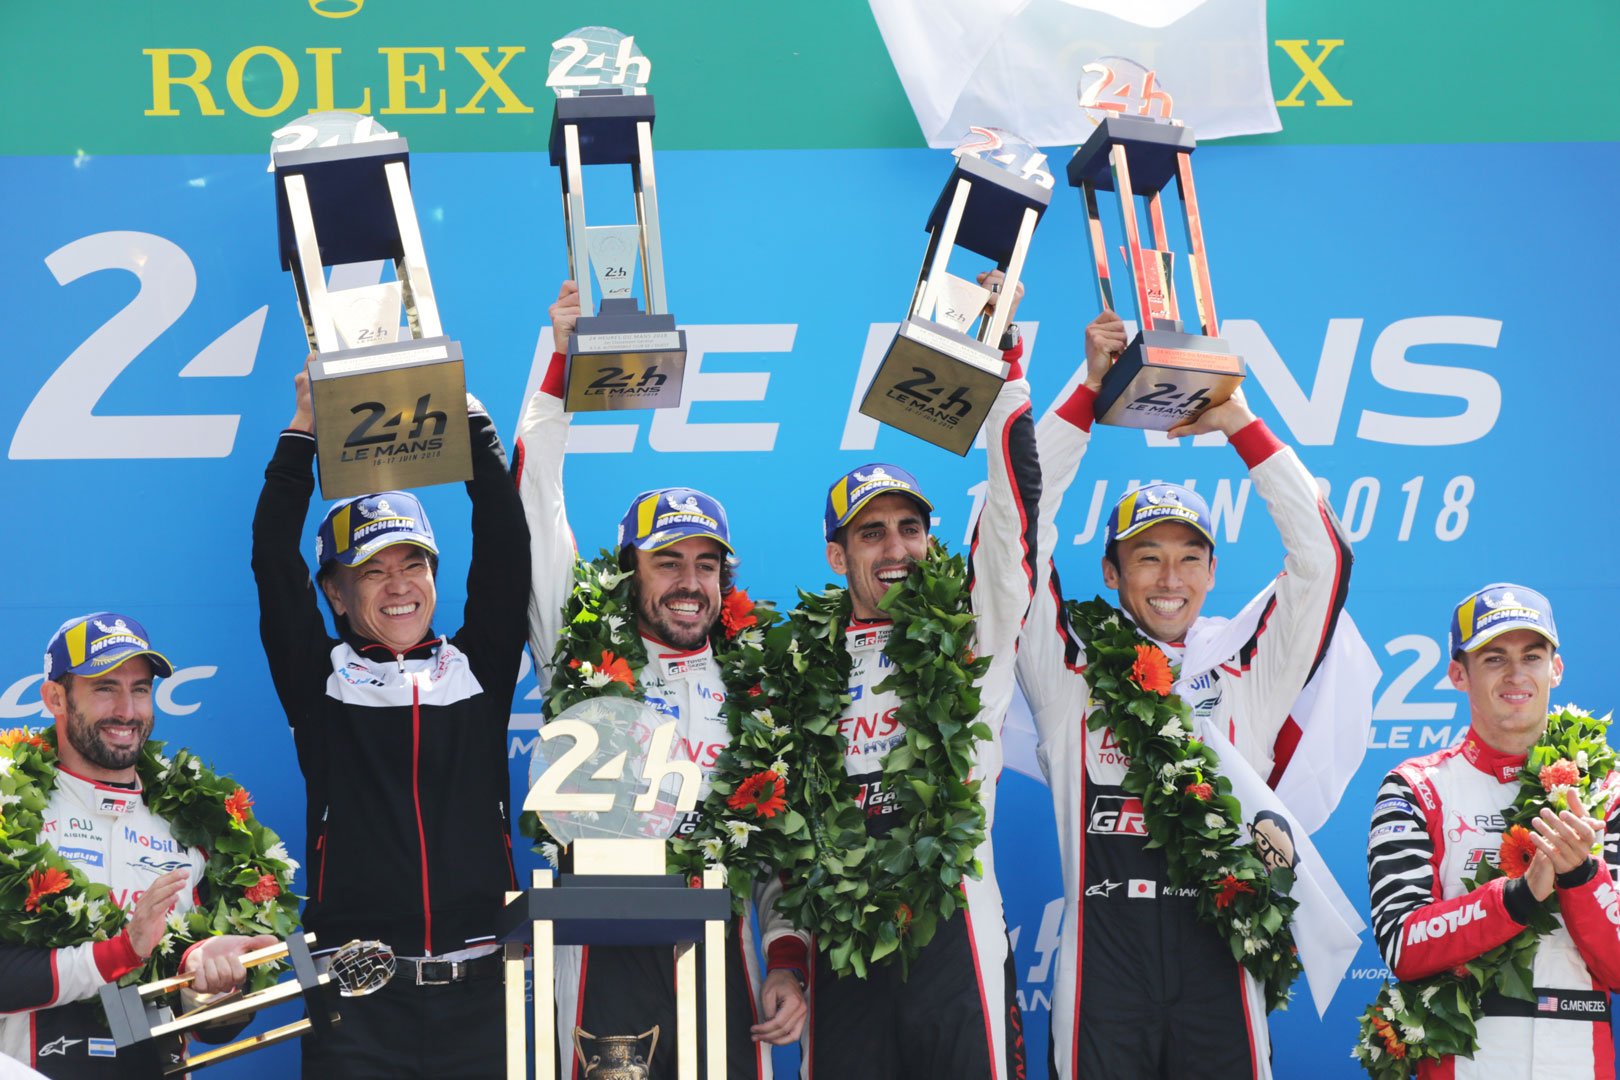 Toyota Gazoo Racing hoist trophy after victory